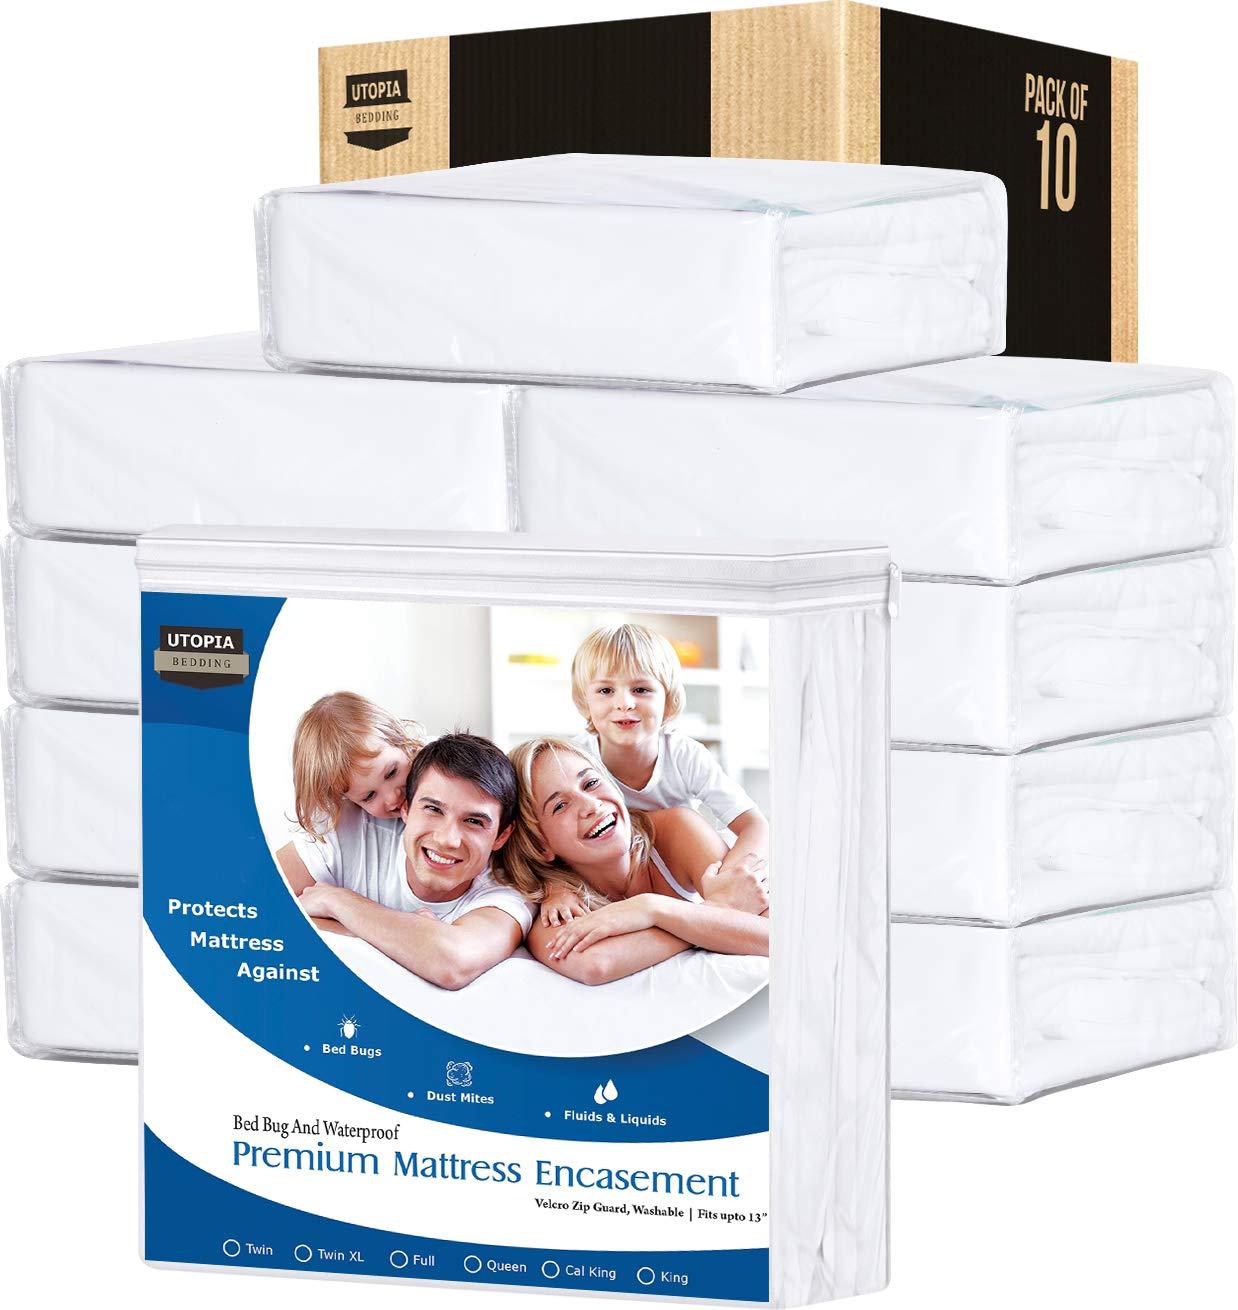 Utopia Bedding Premium Zippered Waterproof Mattress Encasement - Zipper Opening Protector - Fits 13 Inches Deep - Bed Bug Proof (Pack of 10, Twin)